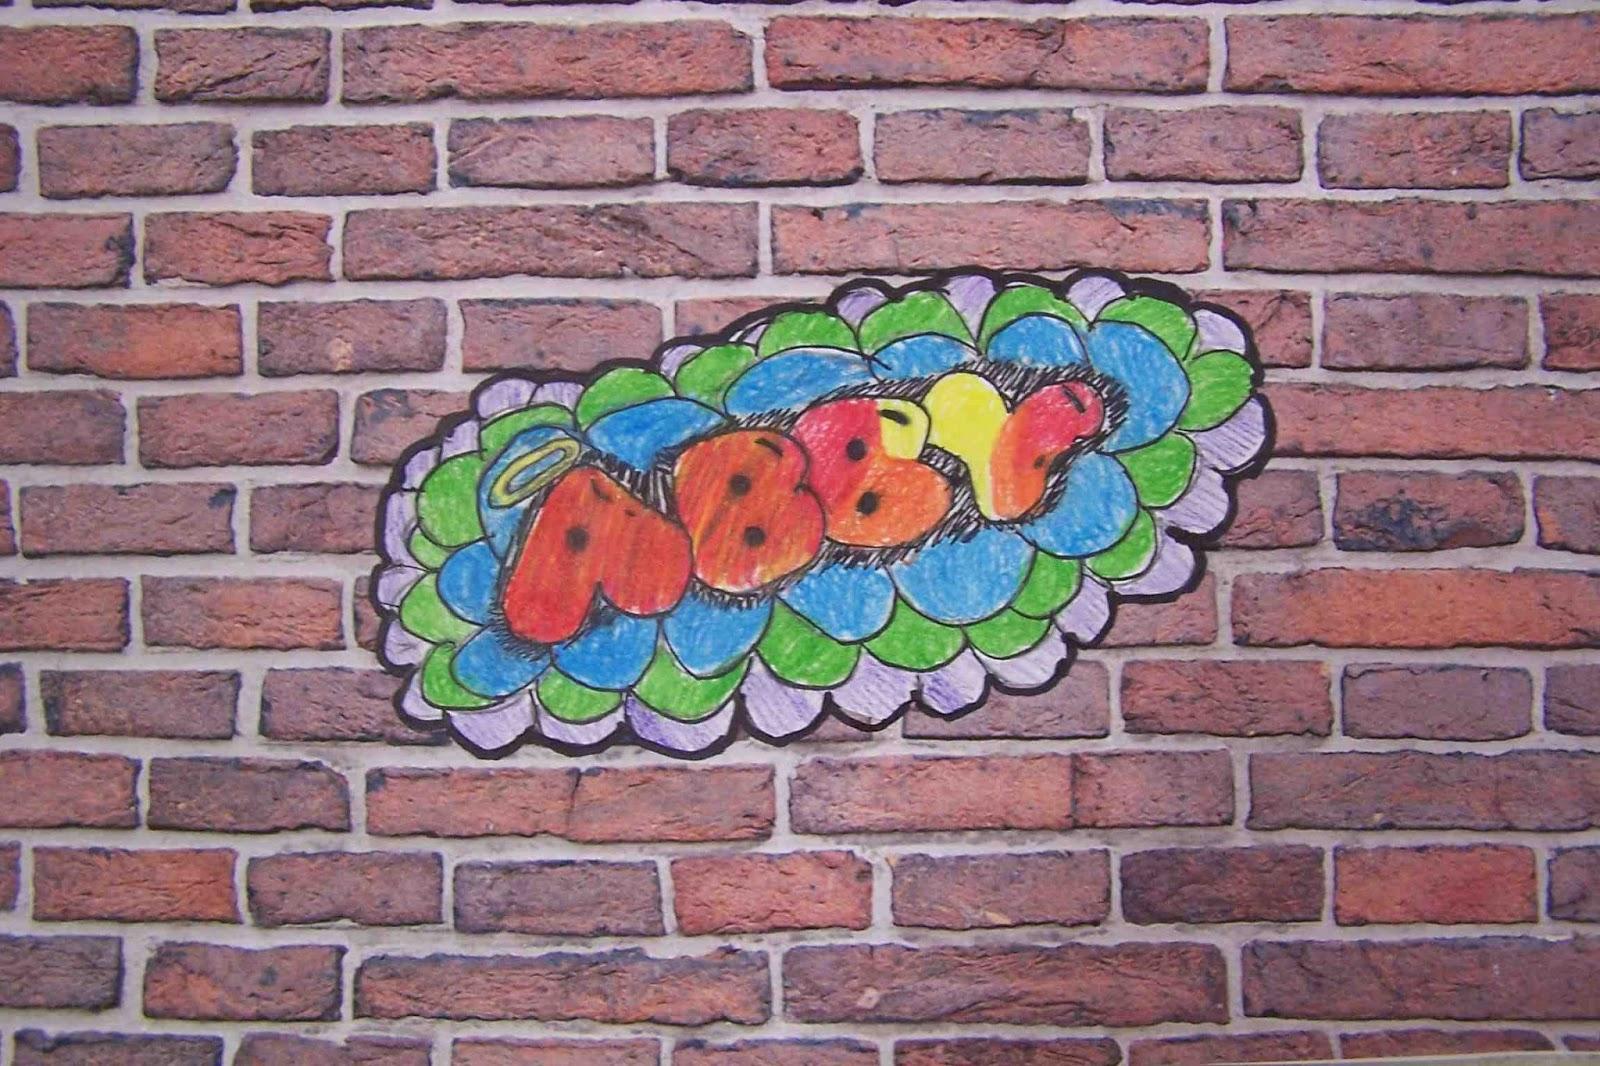 Create Art With Mrs P Graffiti Names Ooh Edgy